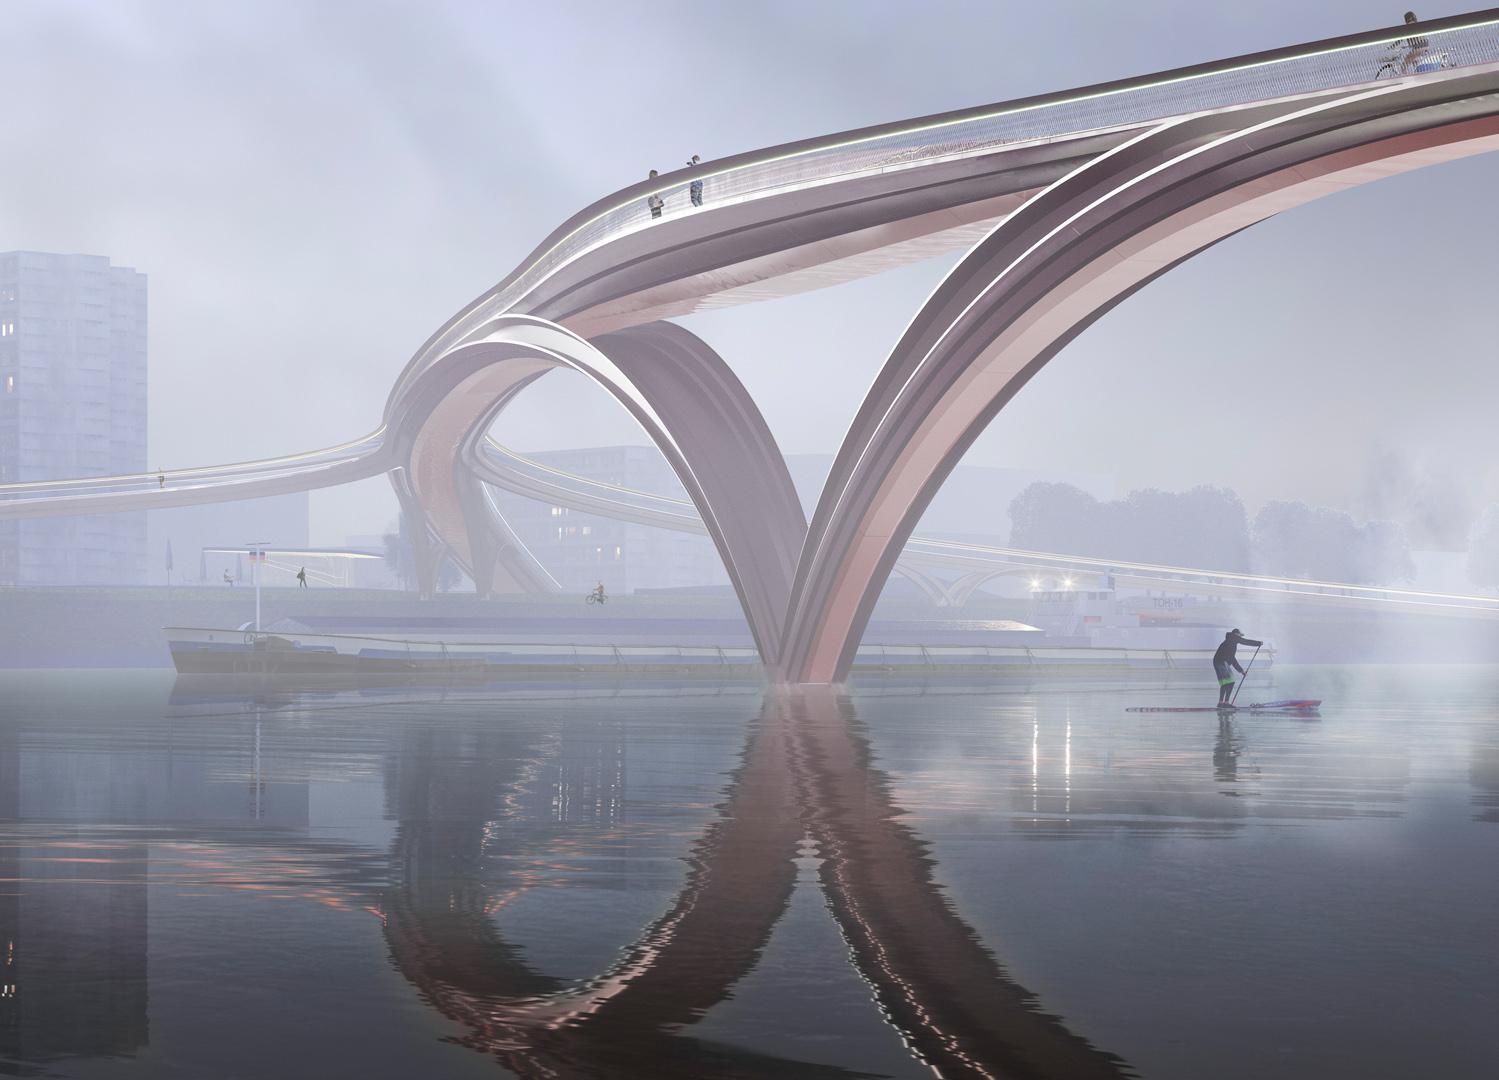 Infrastructure - Cycle and Footbridge, Heidelberg, Germany